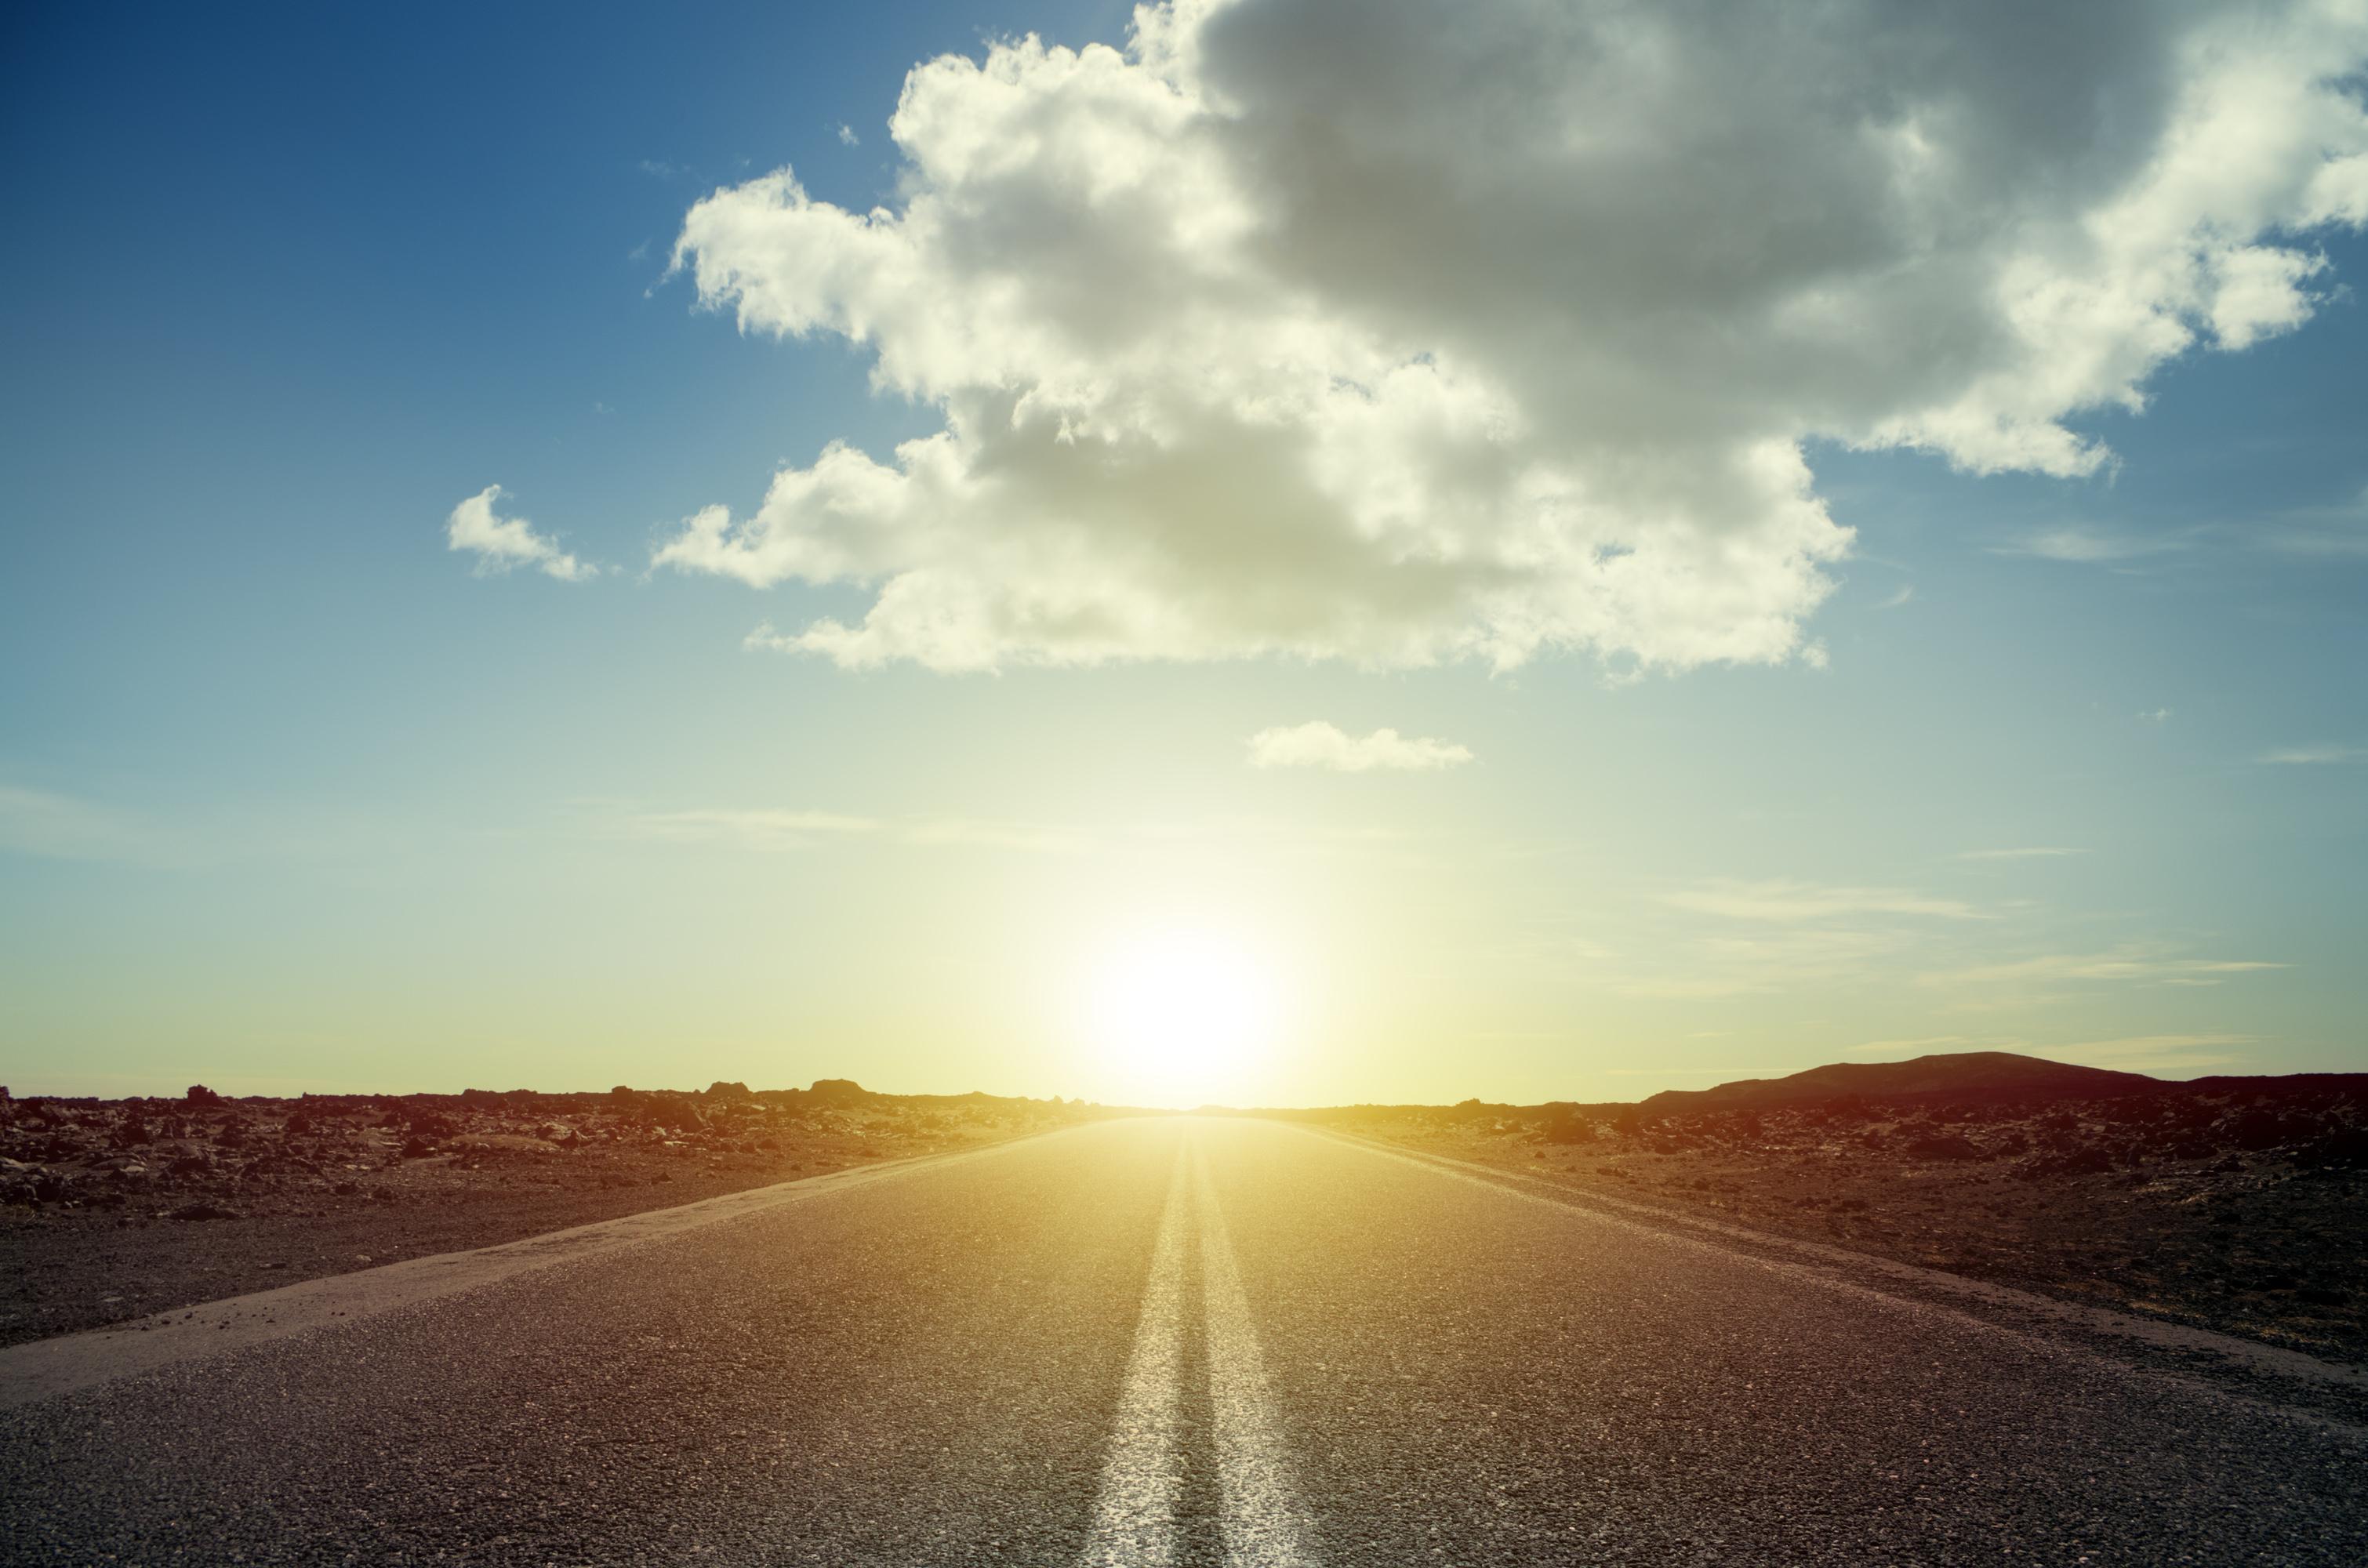 Sun setting over a road.